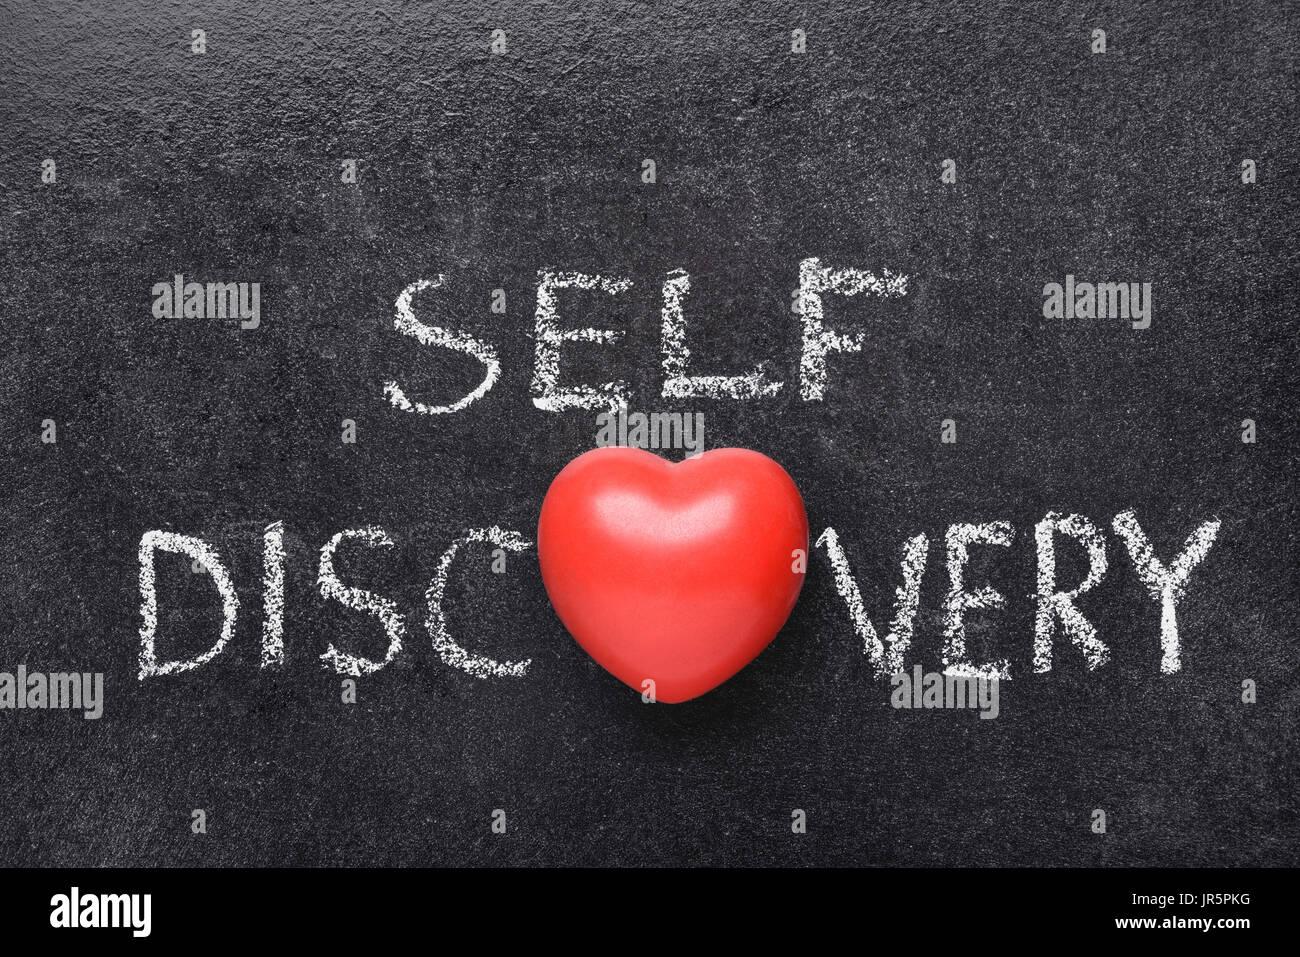 Self discovery heart phrase handwritten on blackboard with heart self discovery heart phrase handwritten on blackboard with heart symbol instead of o biocorpaavc